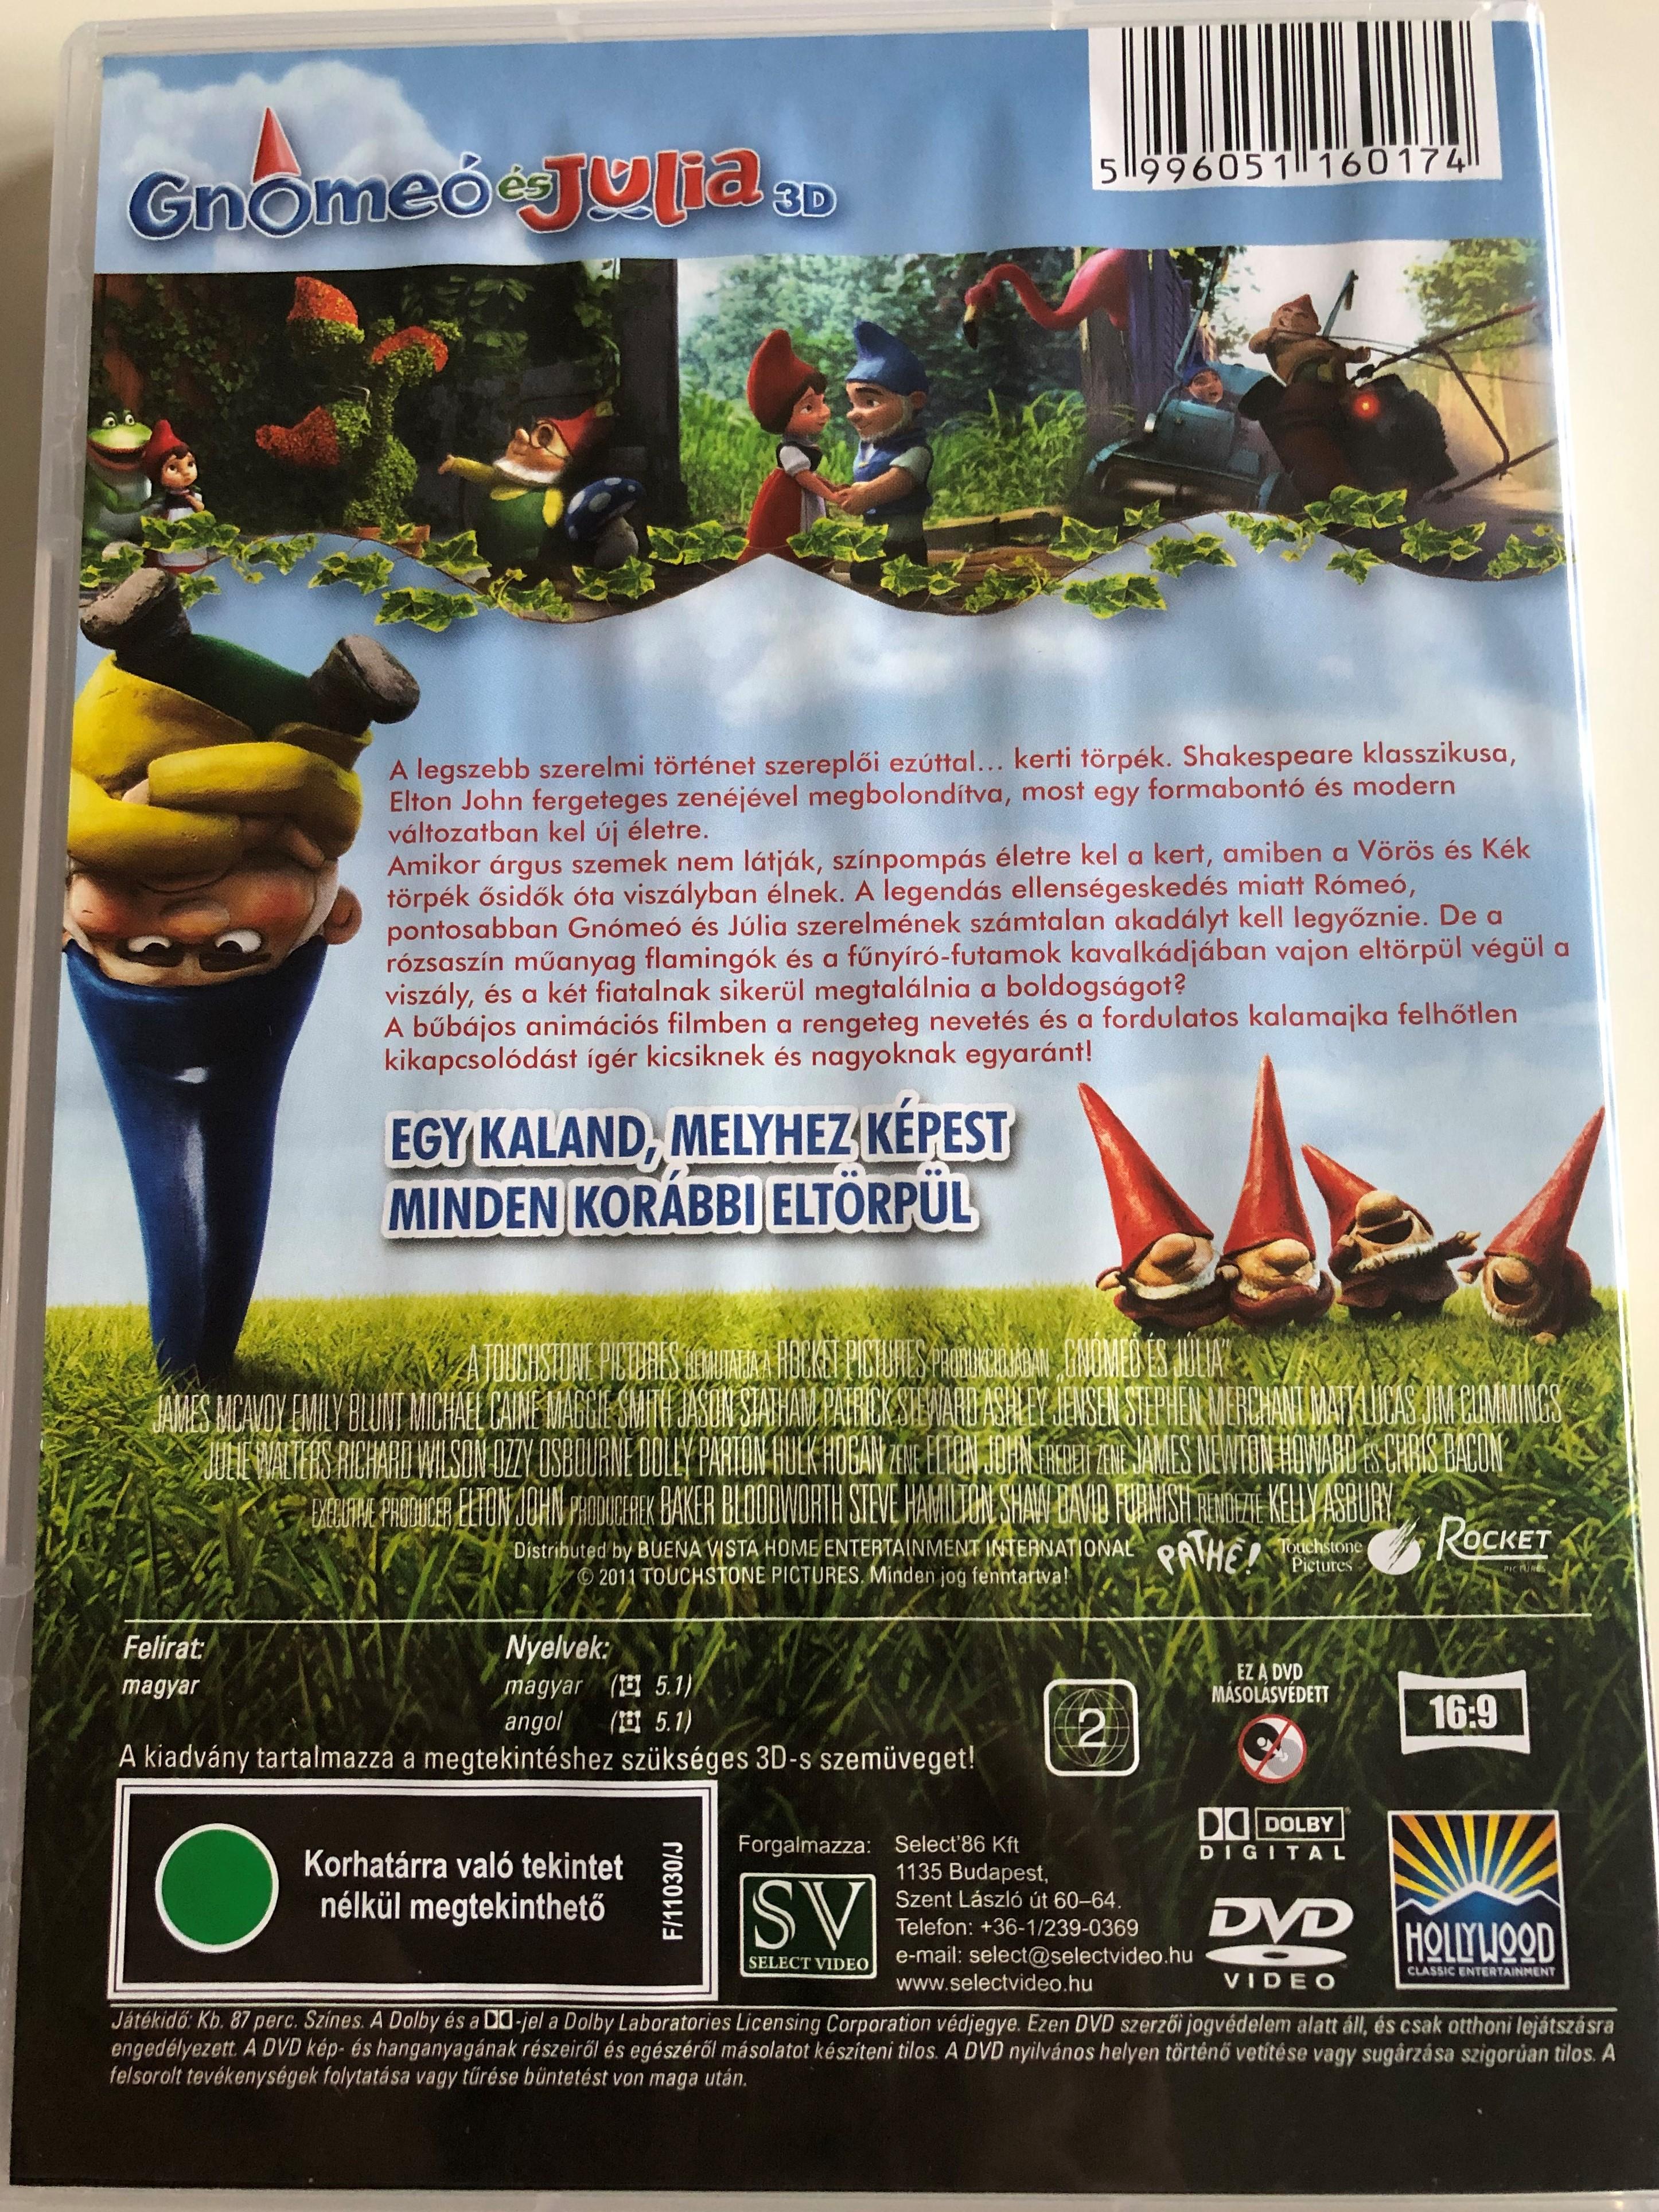 gnomeo-and-juliet-3d-dvd-2011-gnome-s-j-lia-3d-3.jpg